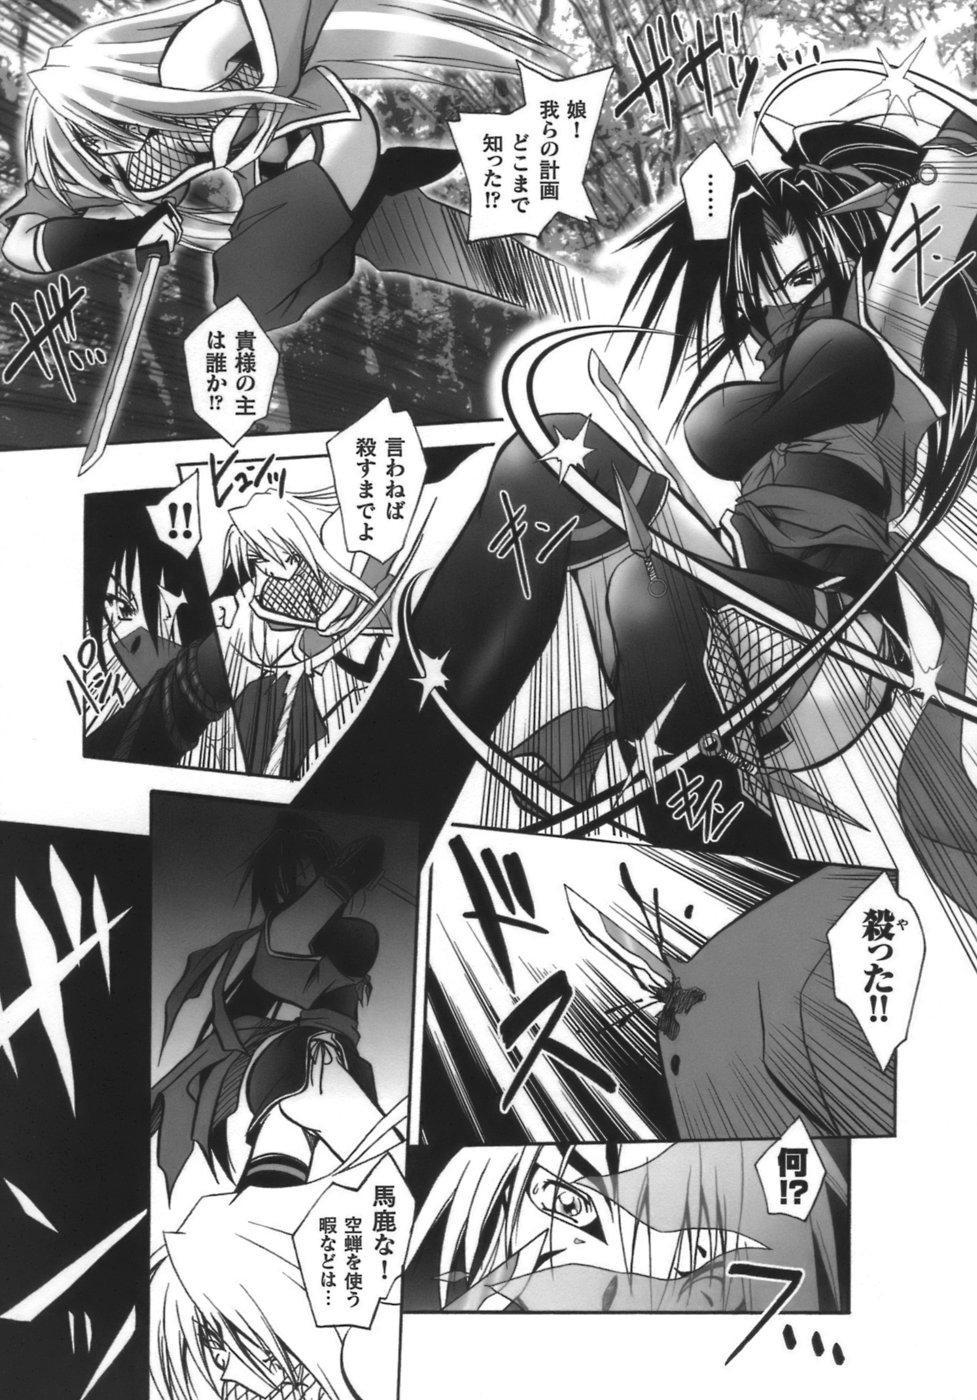 [Parfait] Datenshi-tachi no Chinkonka - Fallen Angels Requiem 41